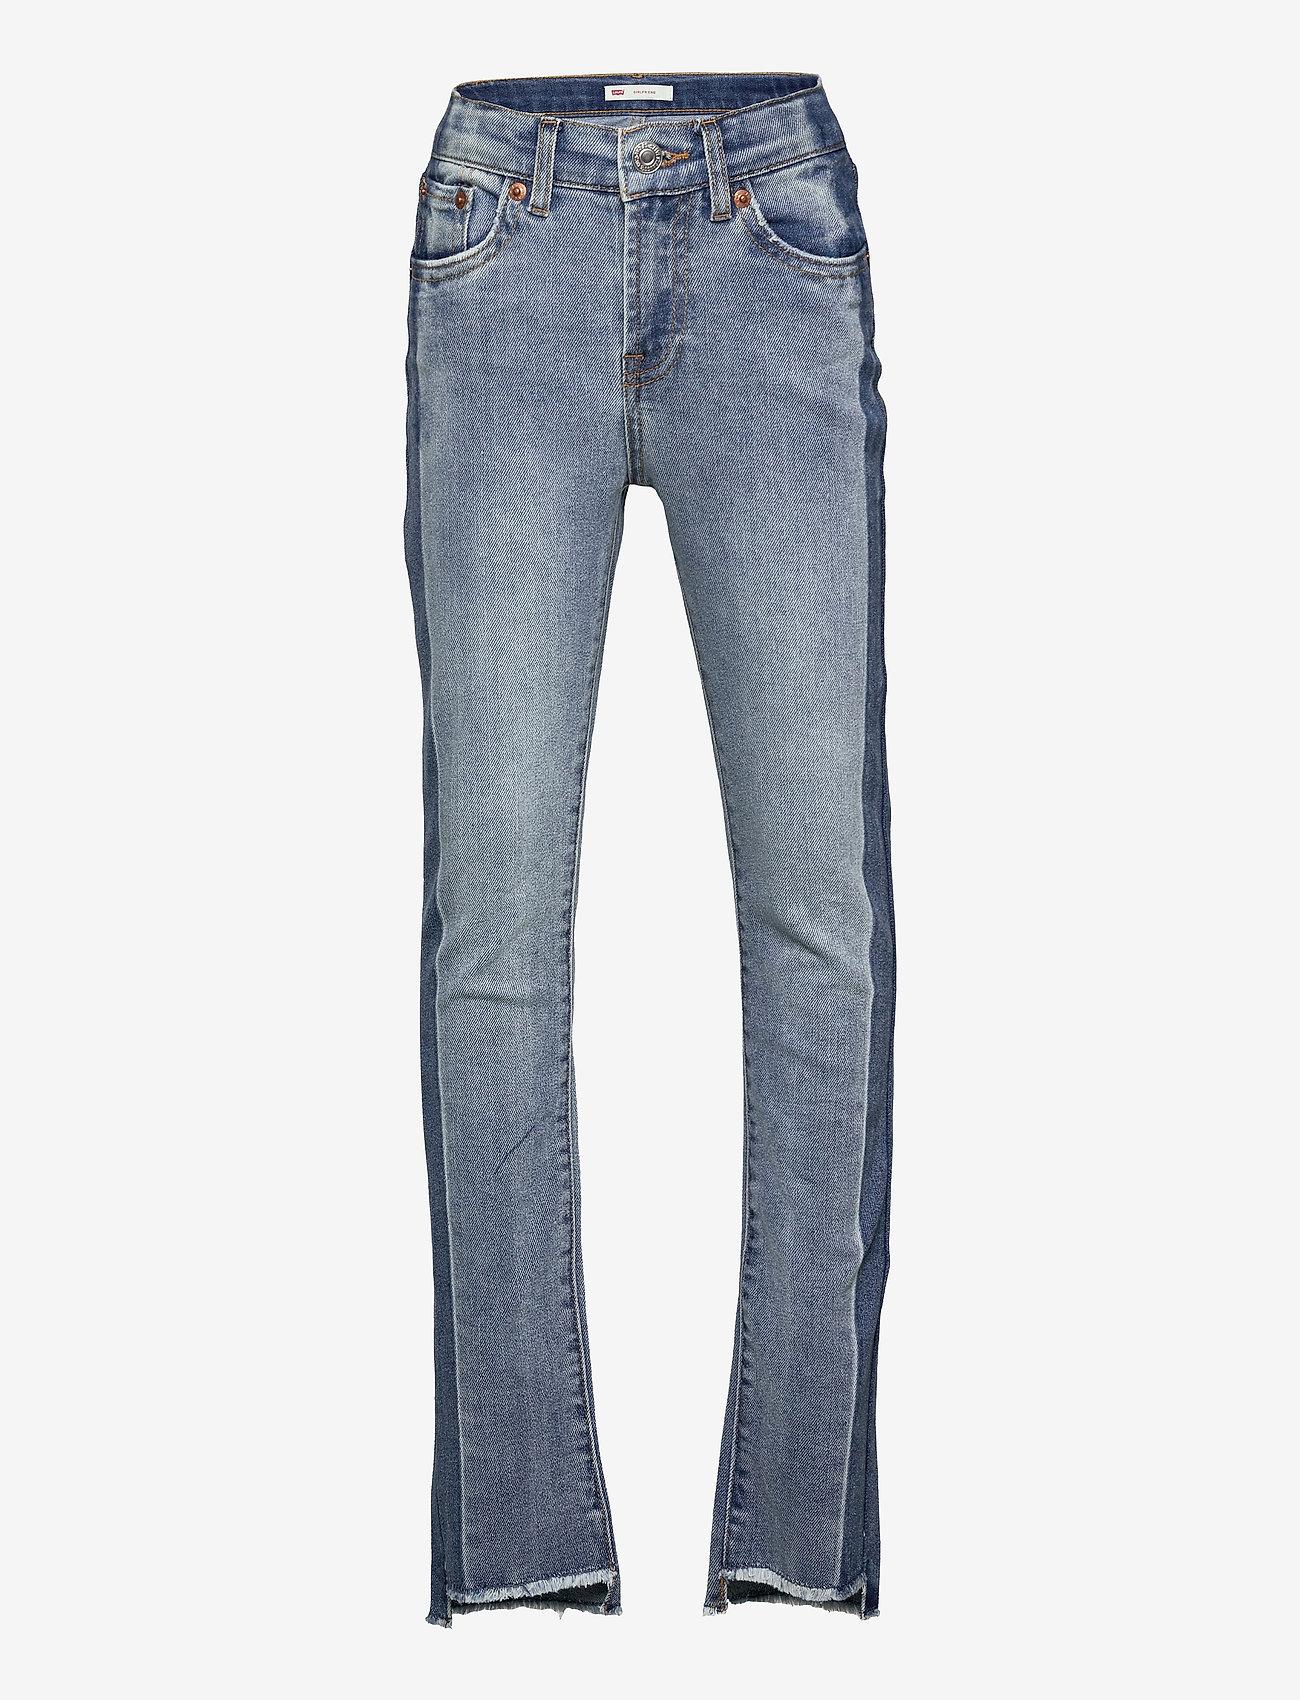 Levi's - GIRLFRIEND JEANS - jeans - gemini - 0